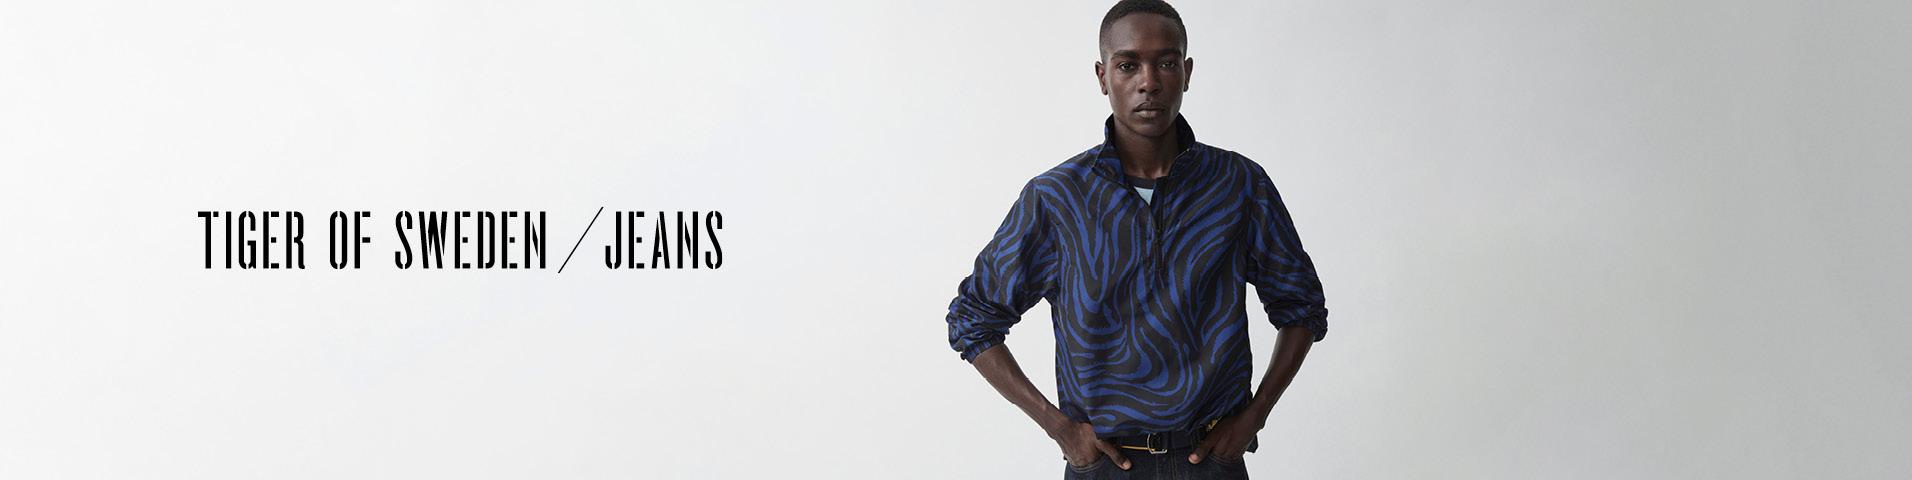 3689daaf5 Tiger of Sweden Jeans Men's Clothing | Stylish Menswear | ZALANDO UK